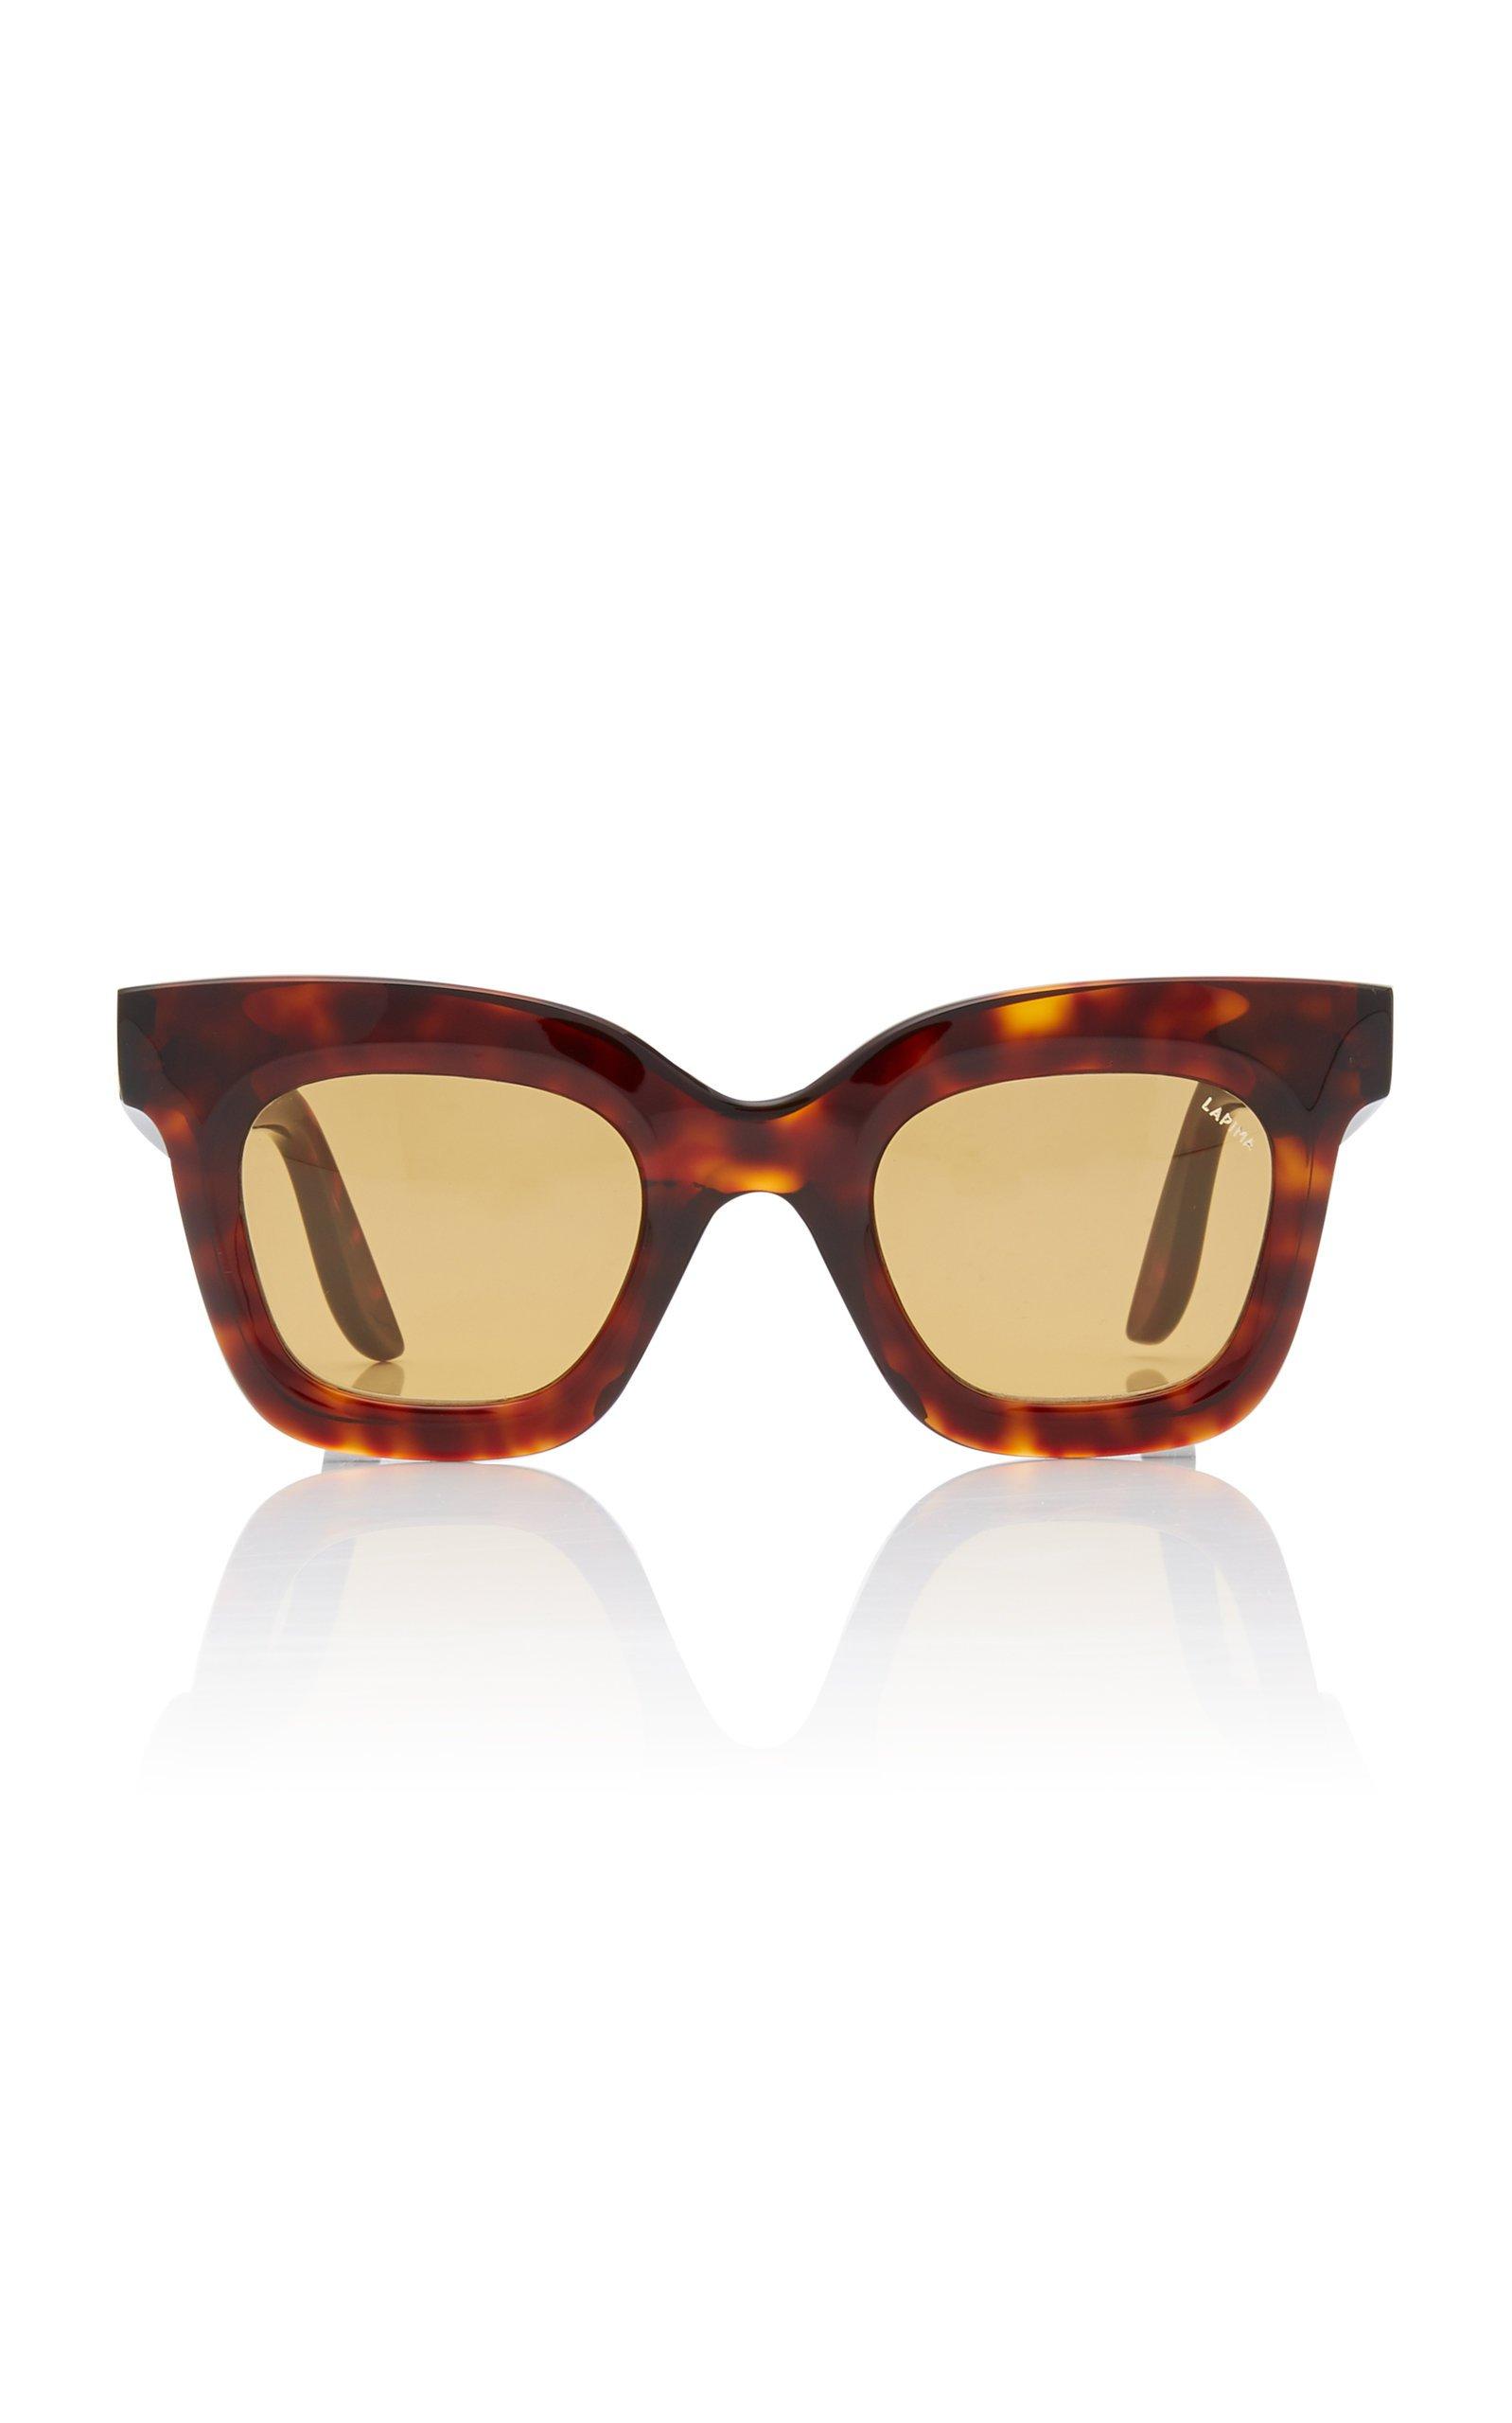 Lapima Lisa Square-Frame Tortoiseshell Acetate Sunglasses